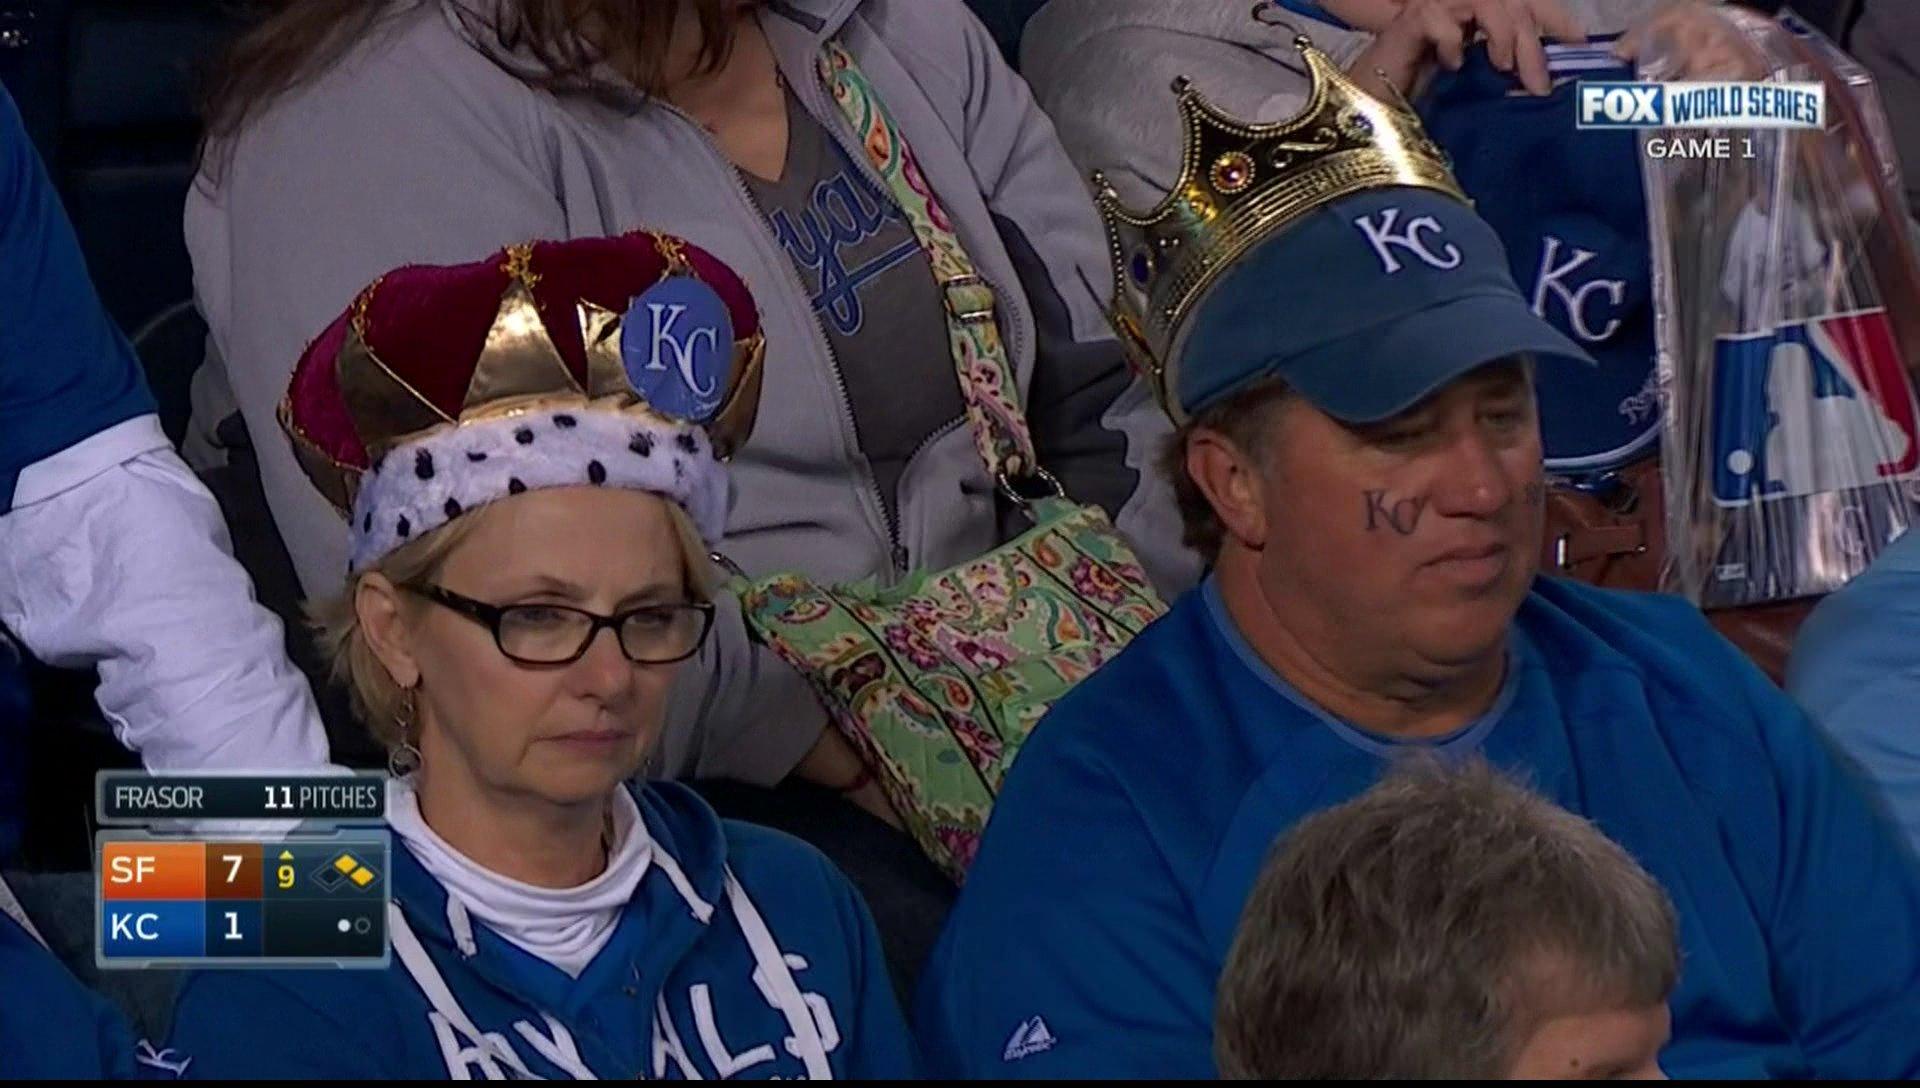 Sad Royals fans dressed up as actual Royals :( :( :(